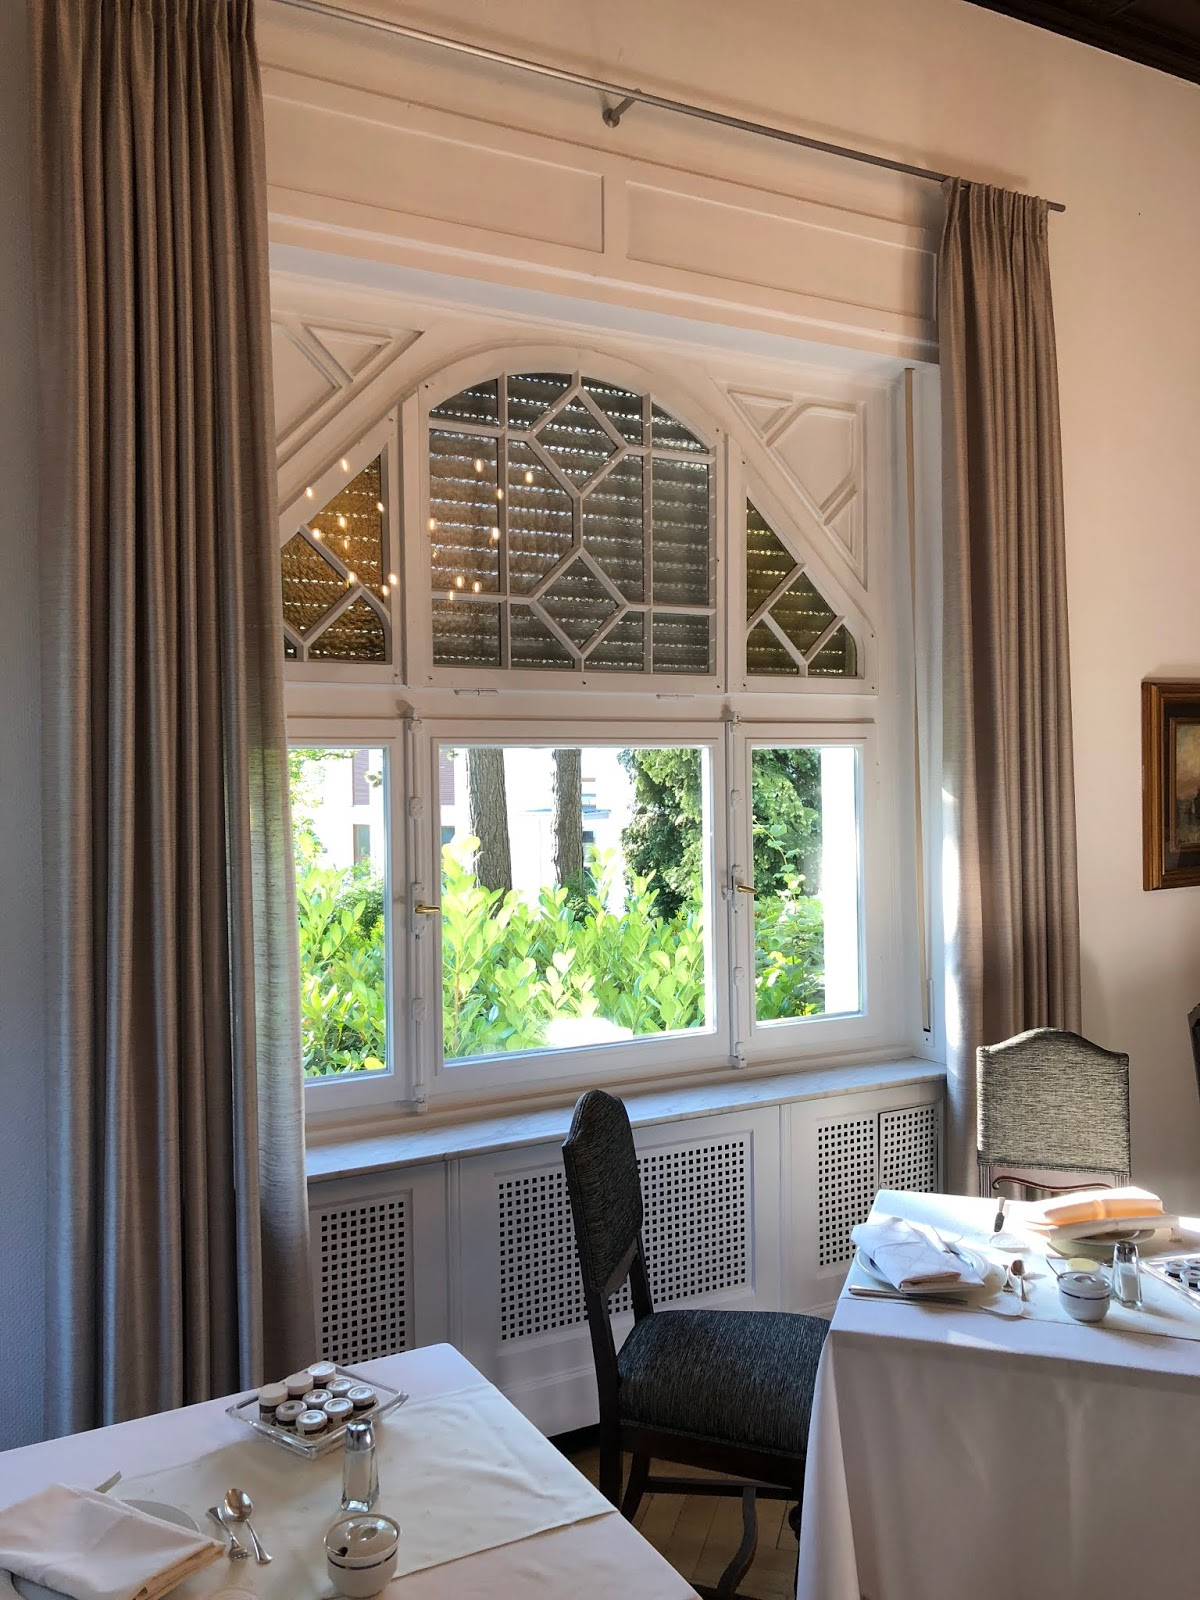 Frühstücksraum im Hotel Scarpati, Wuppertal